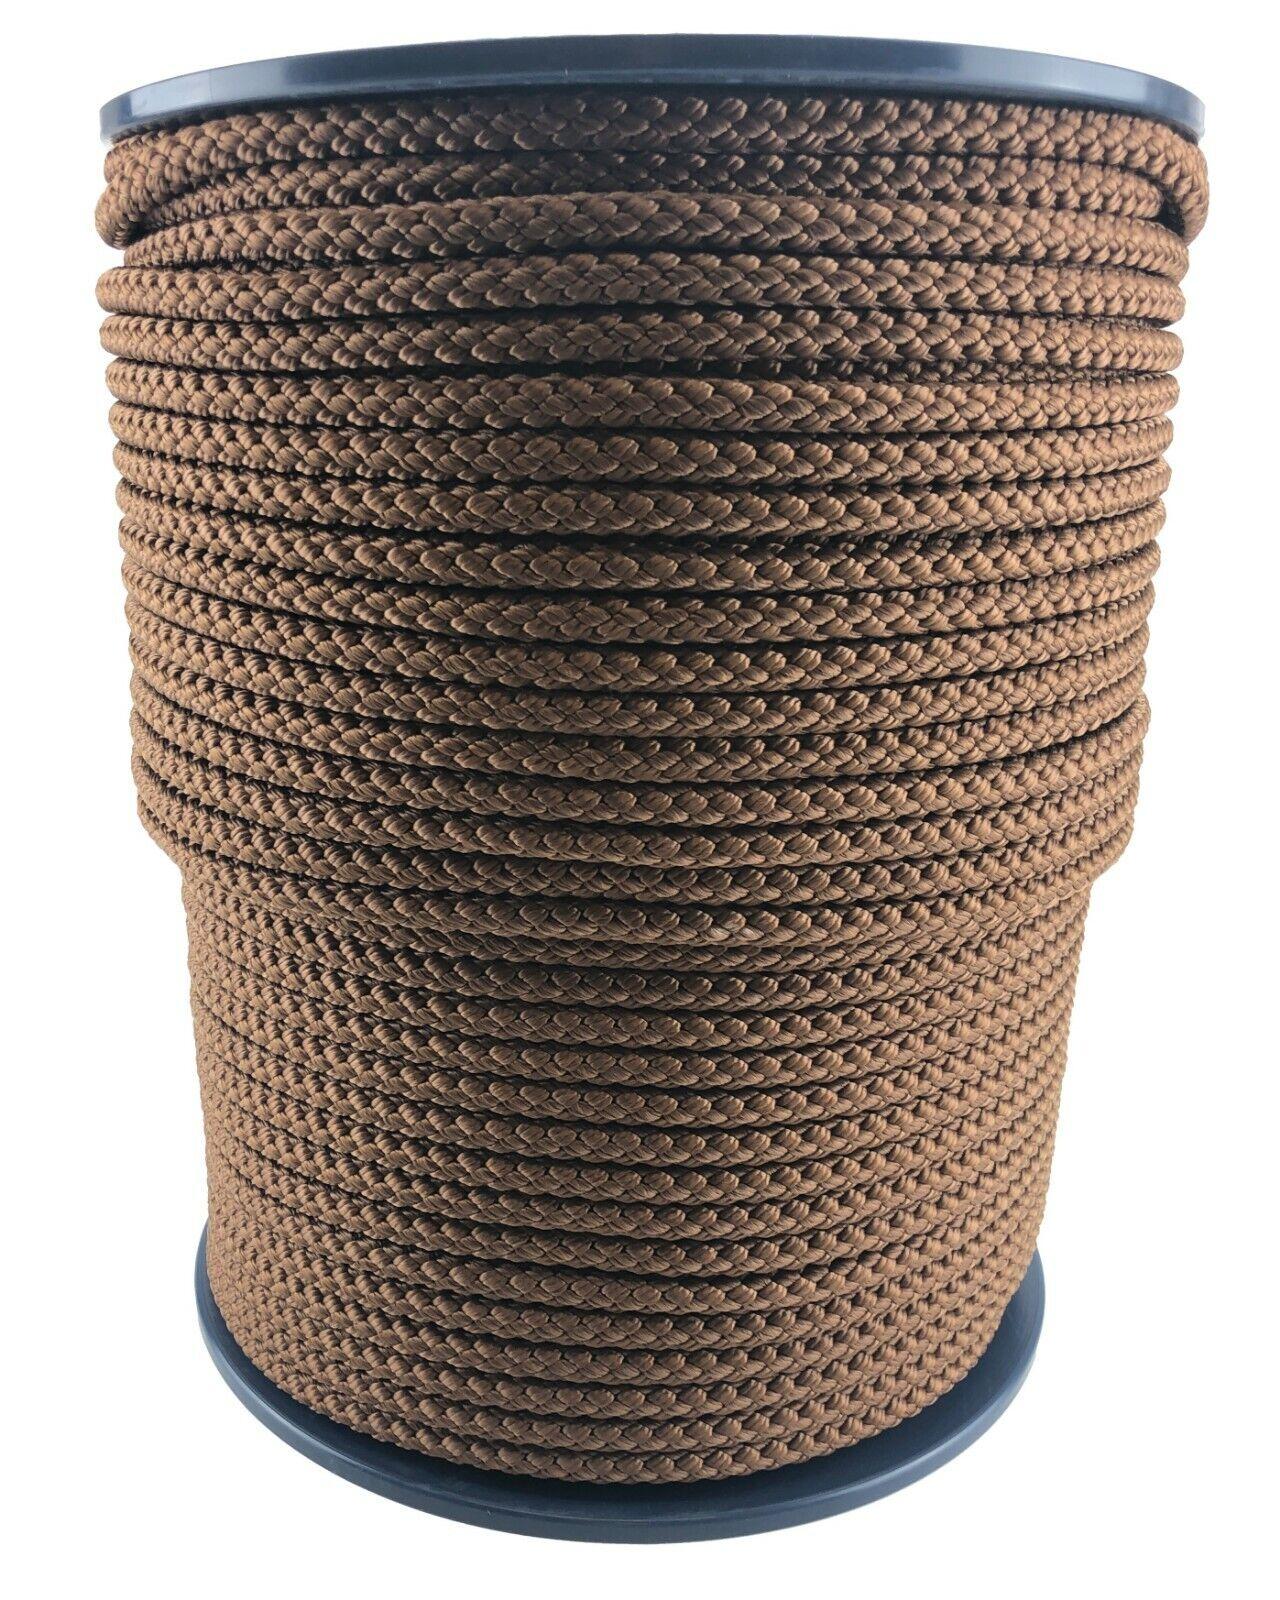 12mm Brown Braided Polypropylene Rope x 50 Metres, Paracord Drawstring Camping